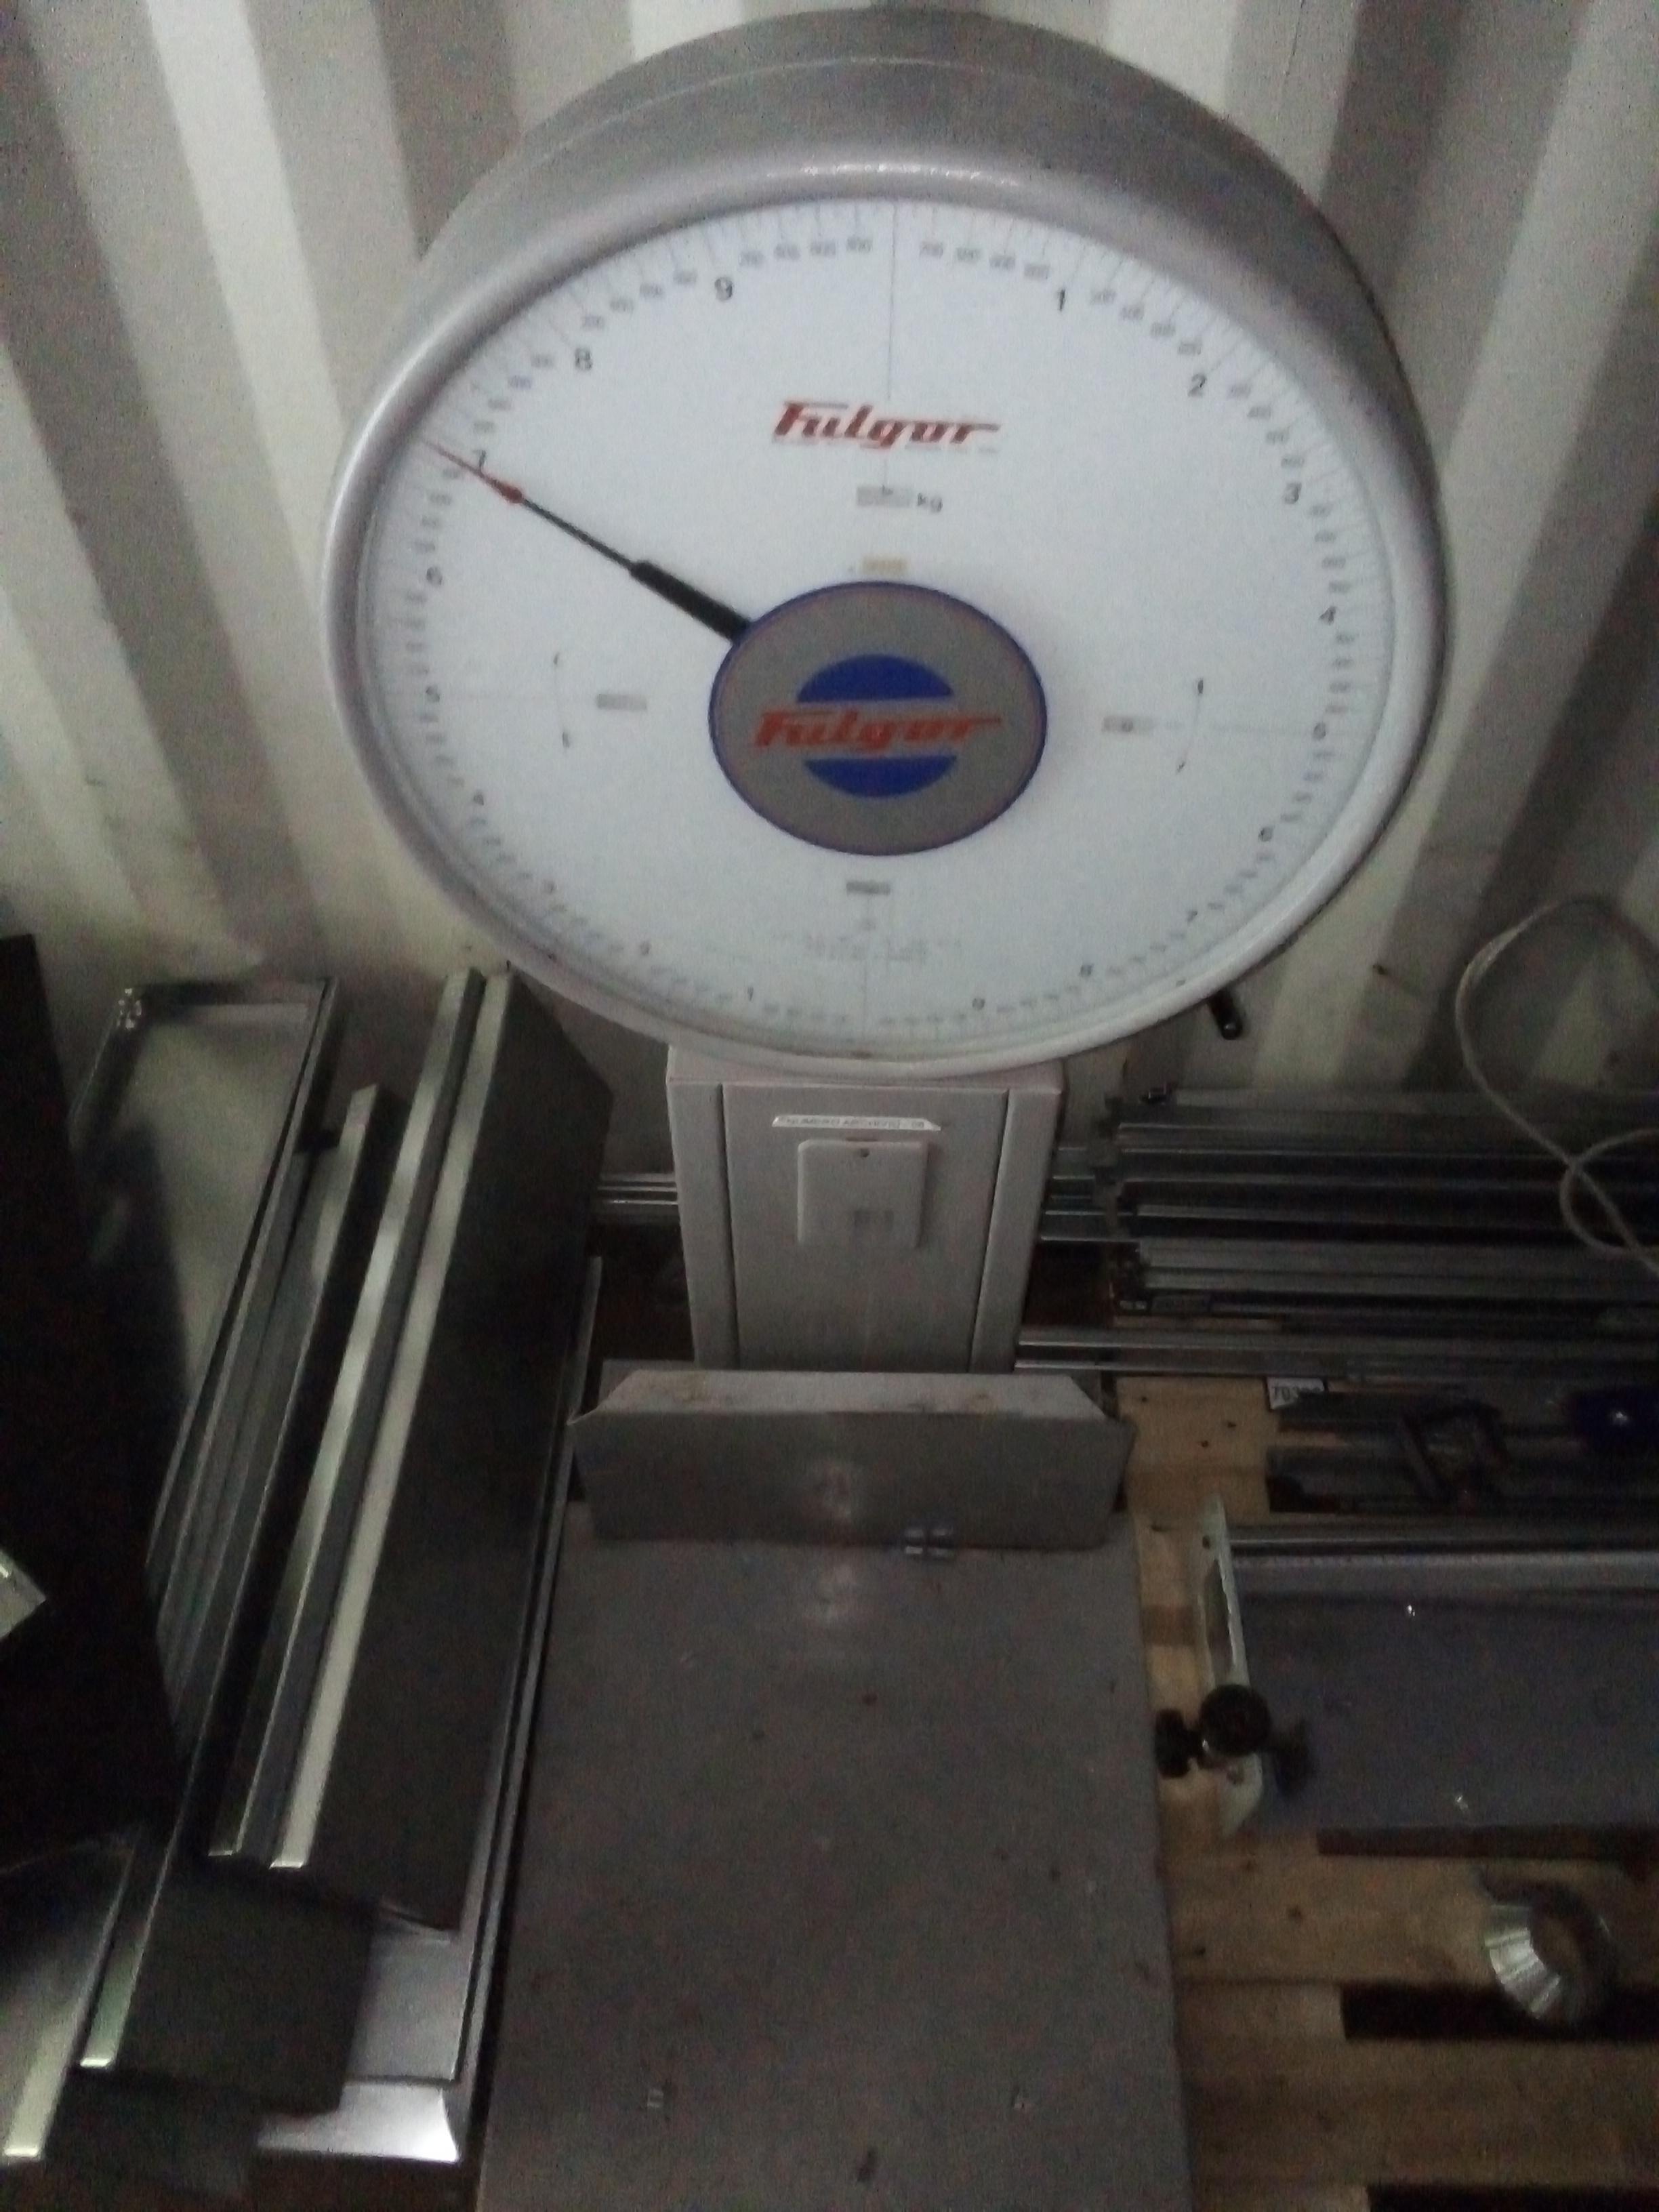 Bilancia Industriale Fulgar in vendita - foto 1